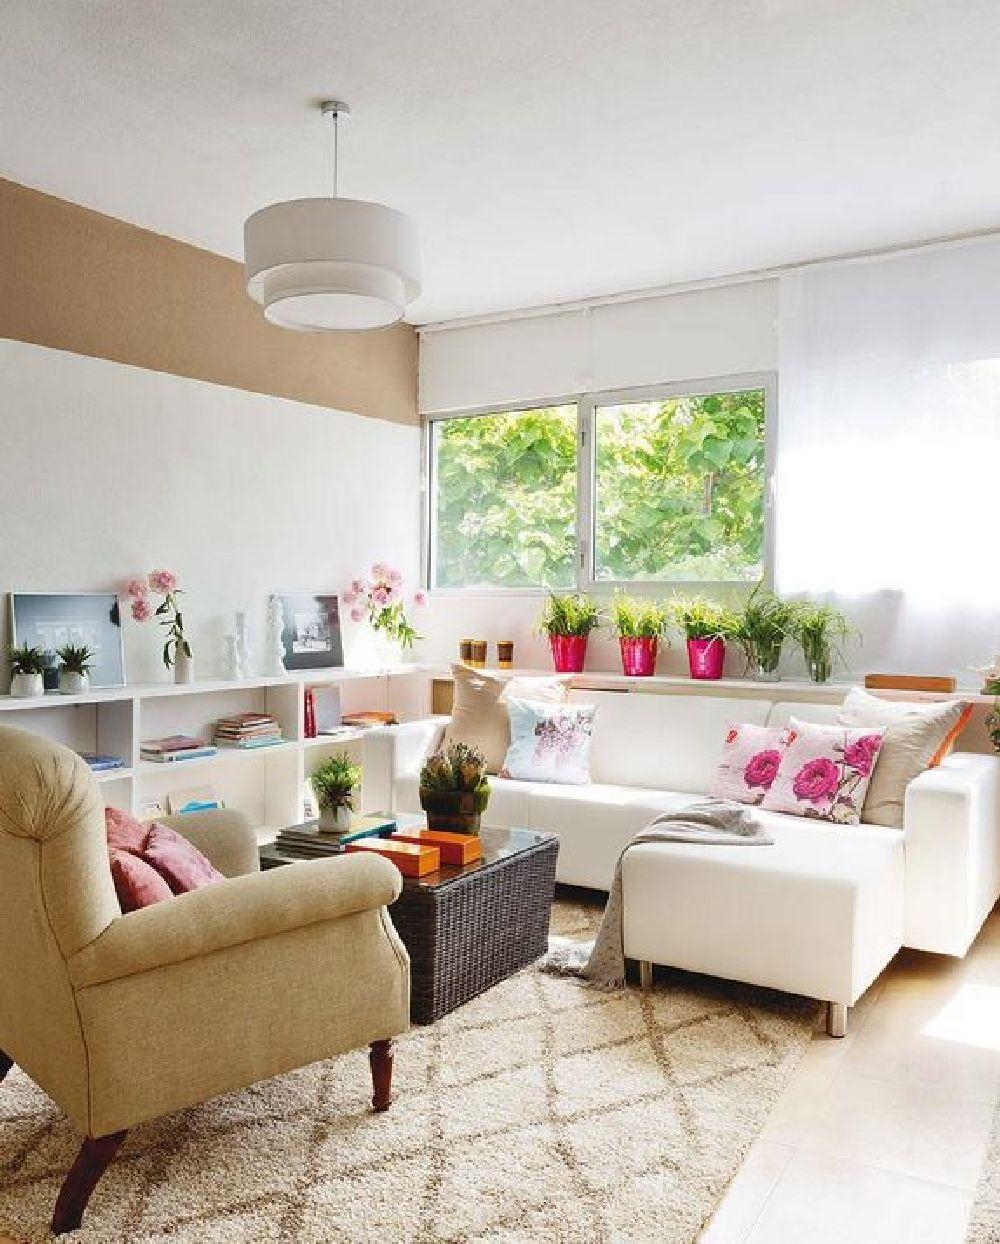 adelaparvu.com despre locuinta de 80 mp decorata cu bani putini, decoratoare Vanessa Guisasola si Sara Yubero, Foto MiCasa (16)